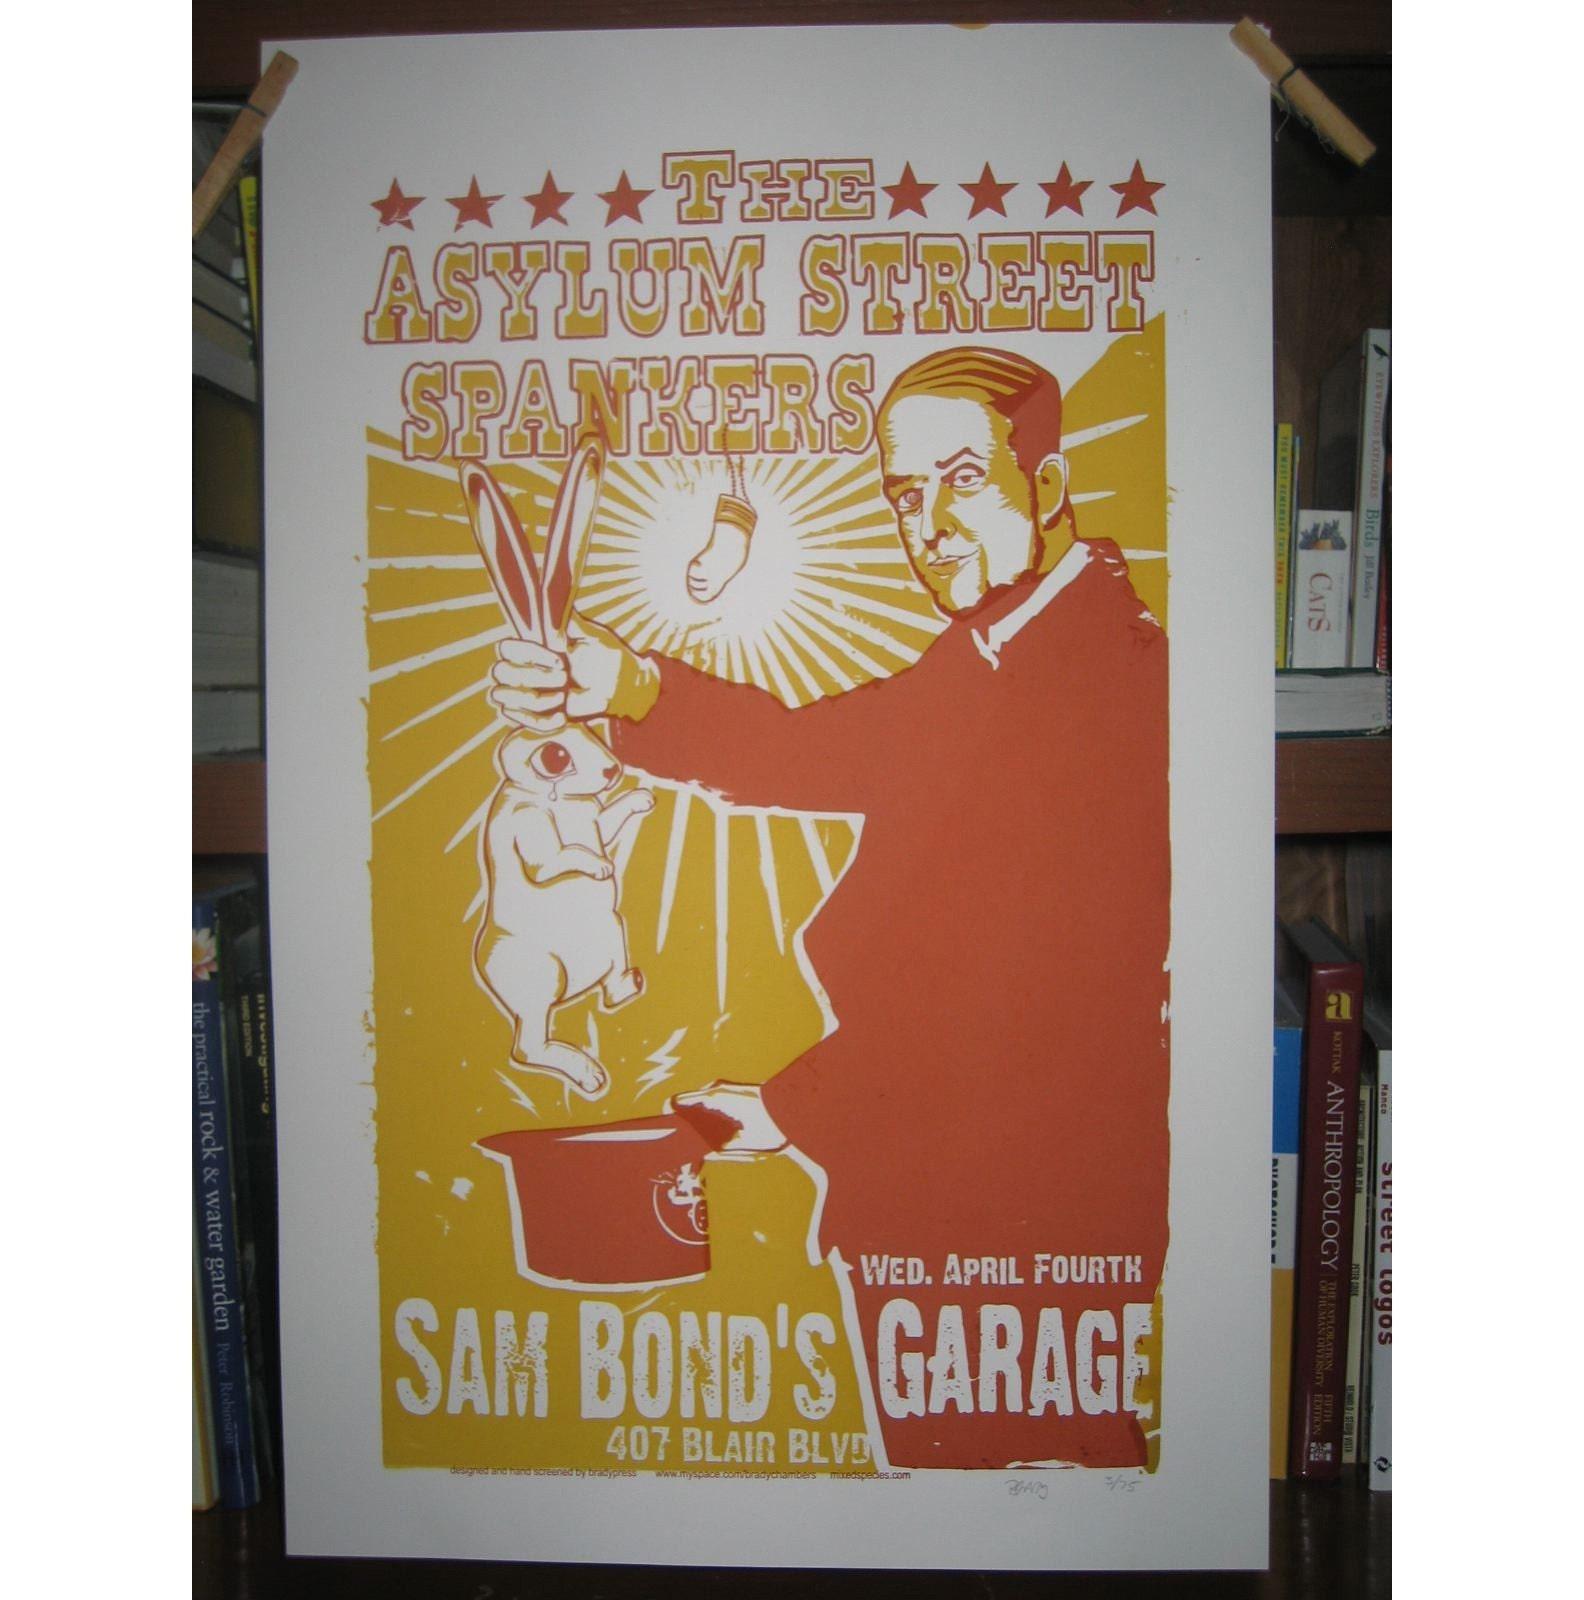 Asylum Street Spankers Rock Poster